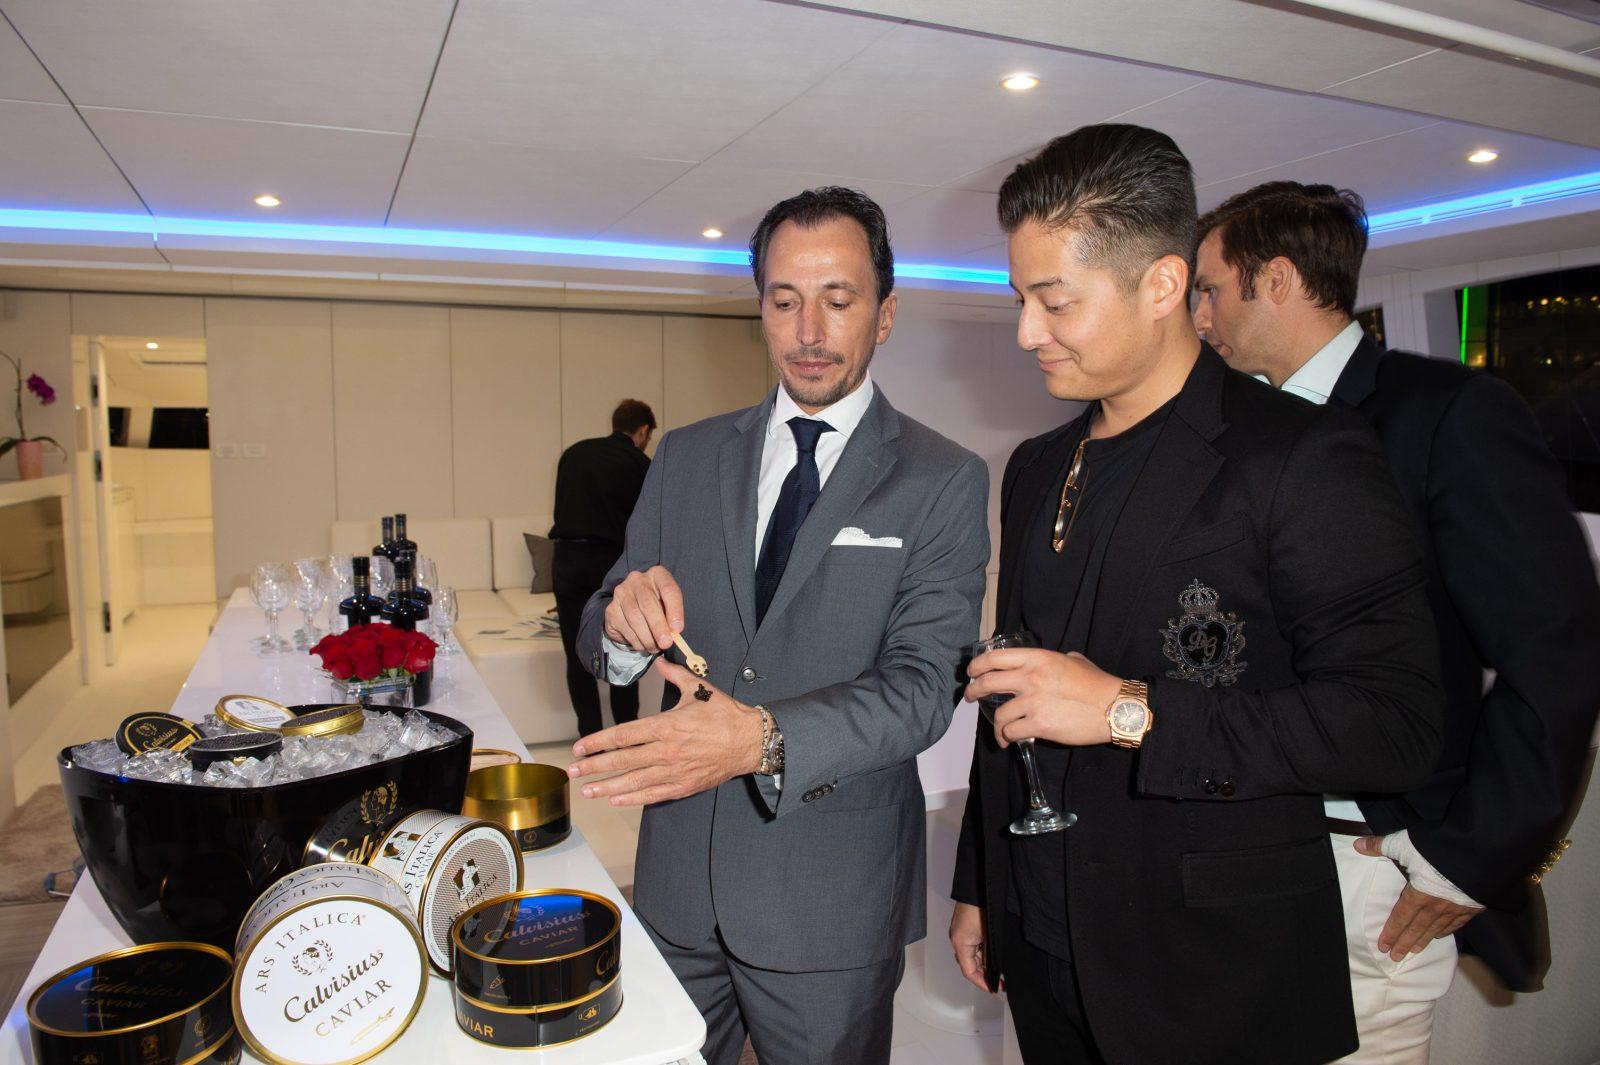 Michael Pulchino trying Calvisius Caviar